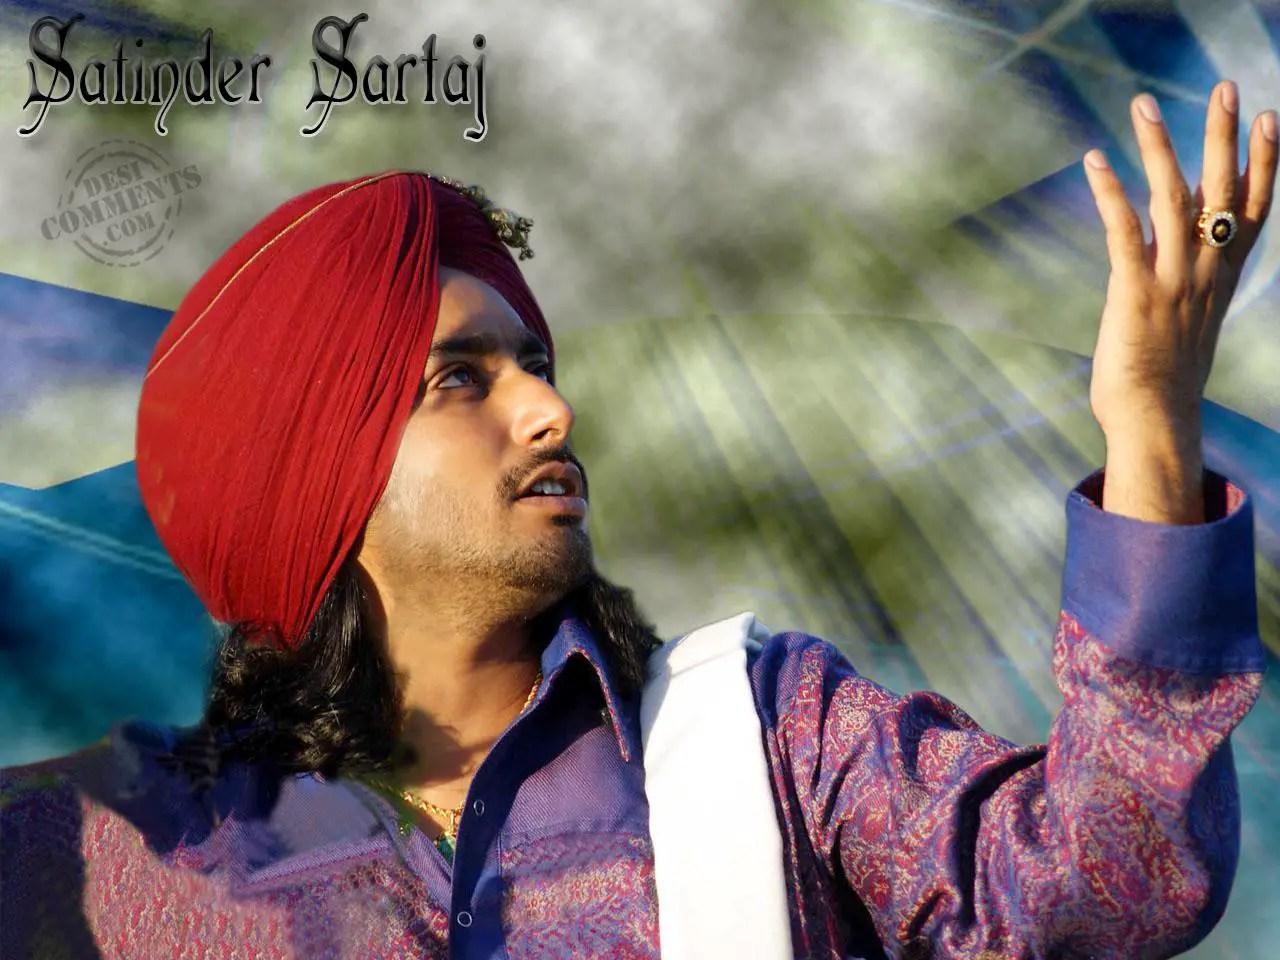 Hindi Quotes Wallpaper Sad Satinder Sartaj Punjabi Celebrities Wallpapers